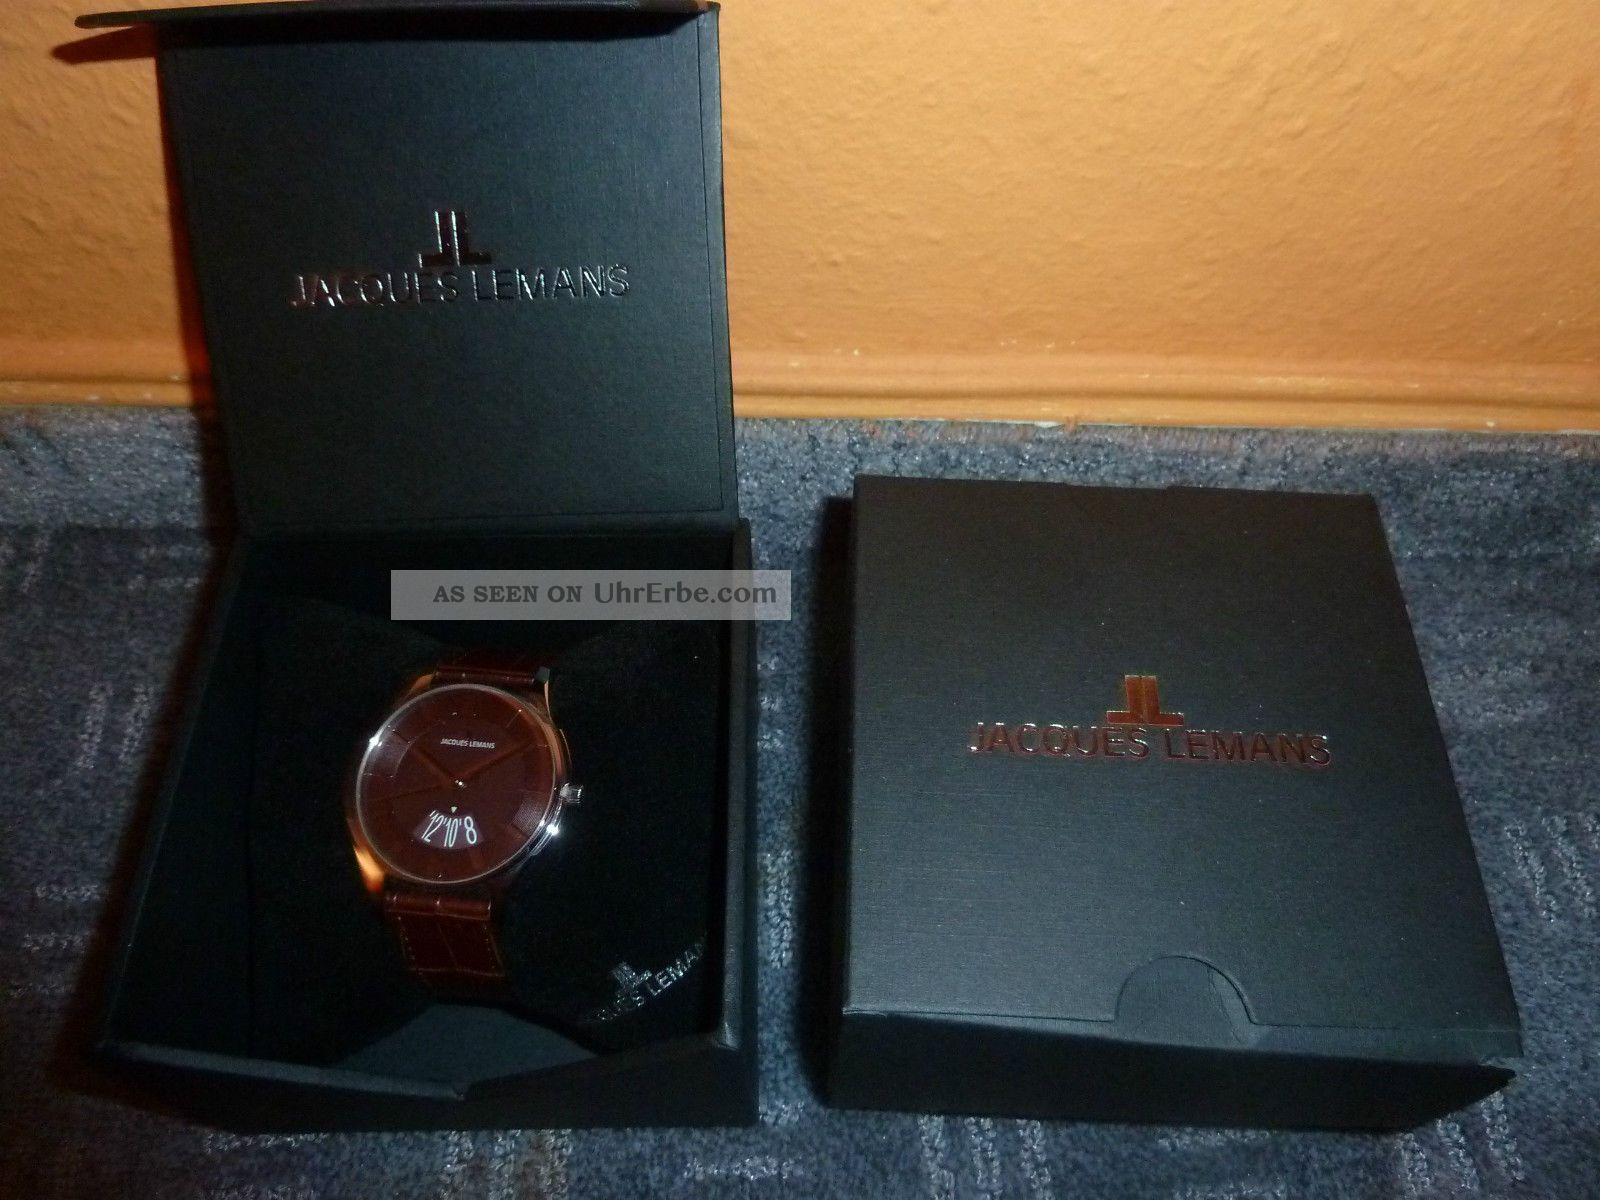 Jacques Lemans London 1746d Uhr Armbanduhr Top Ovp Stylish Armbanduhren Bild